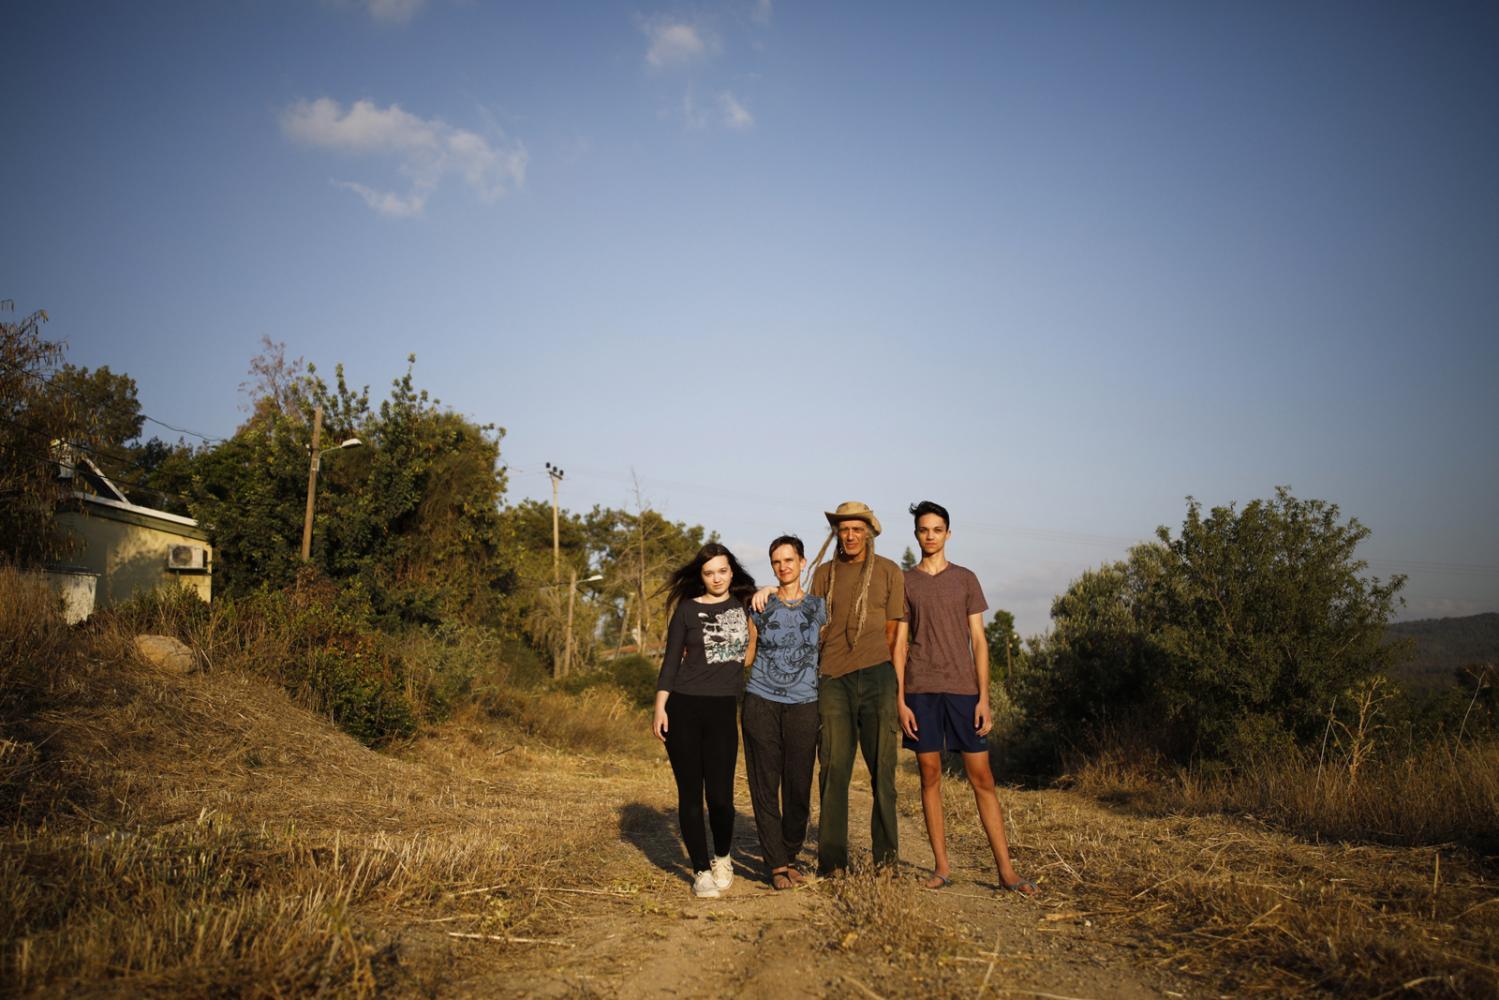 Shenhav,14, Betti Cohen Kowalski, 50, Eitan Cohen, 63, and Yahel, 16, (L-R) pose for portrait in the area where they live, in Kibbutz Harel, Israel, May 30, 2018.